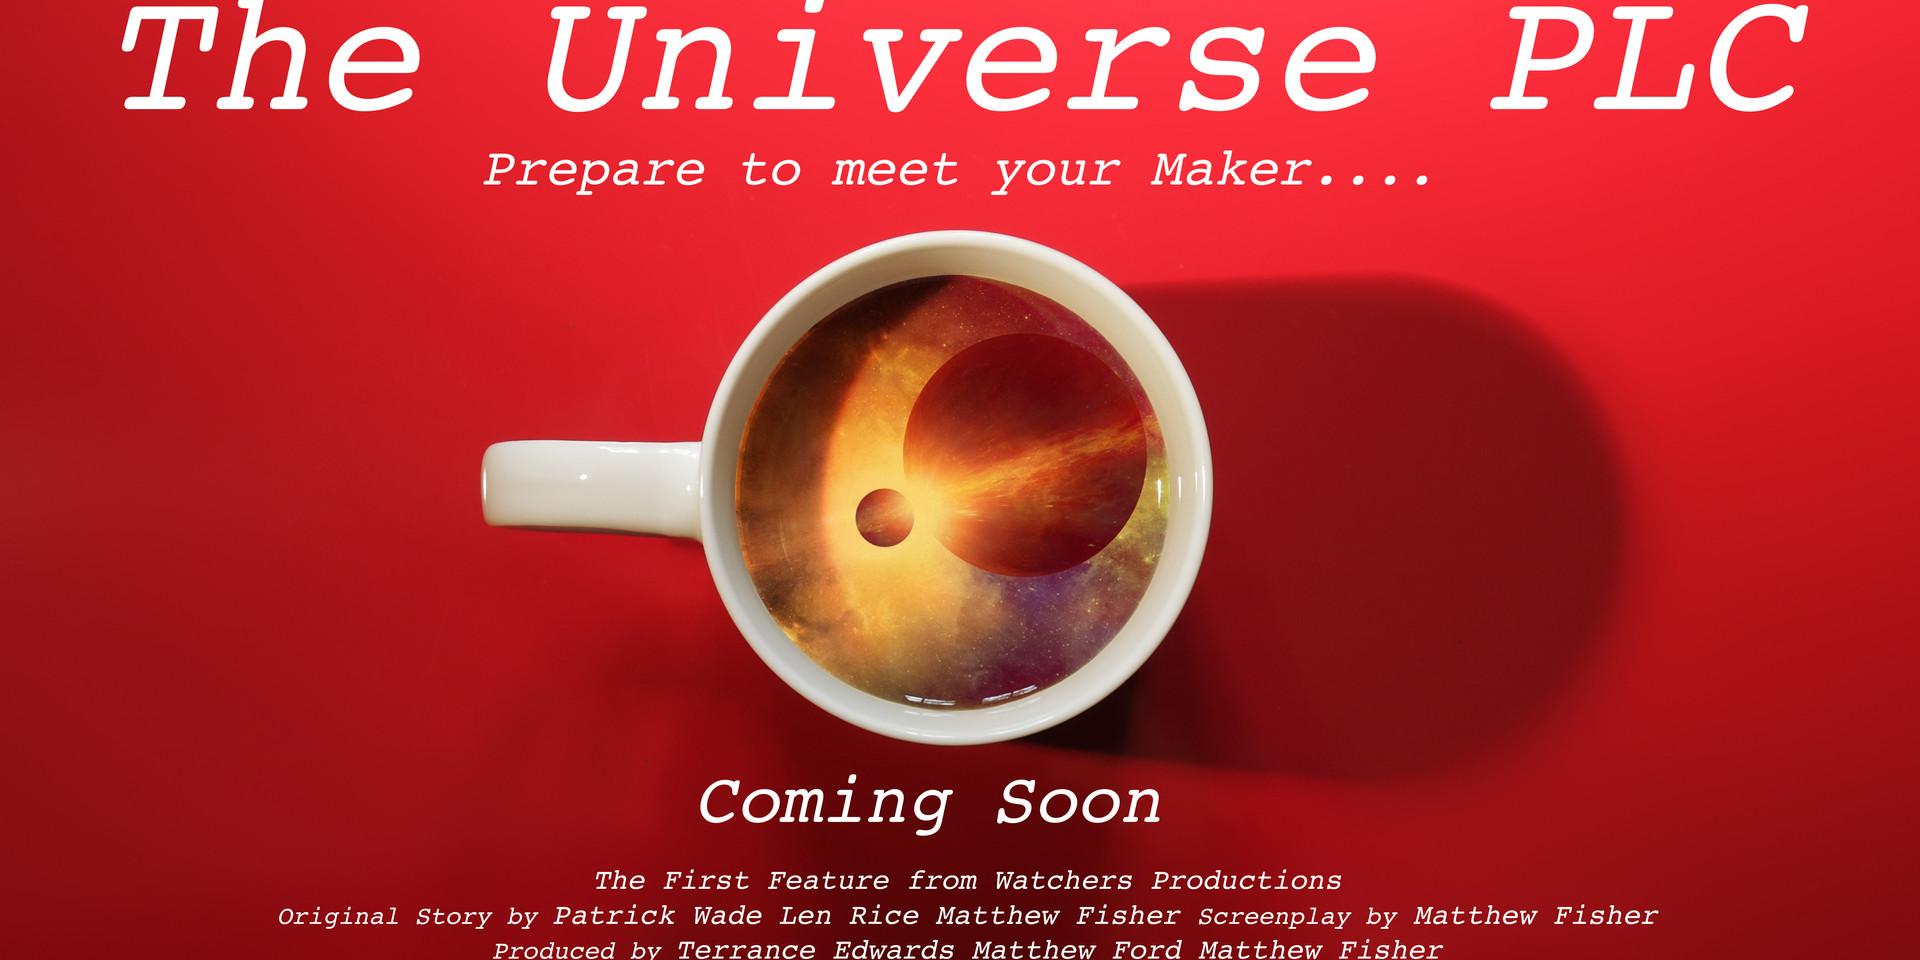 The Universe PLC